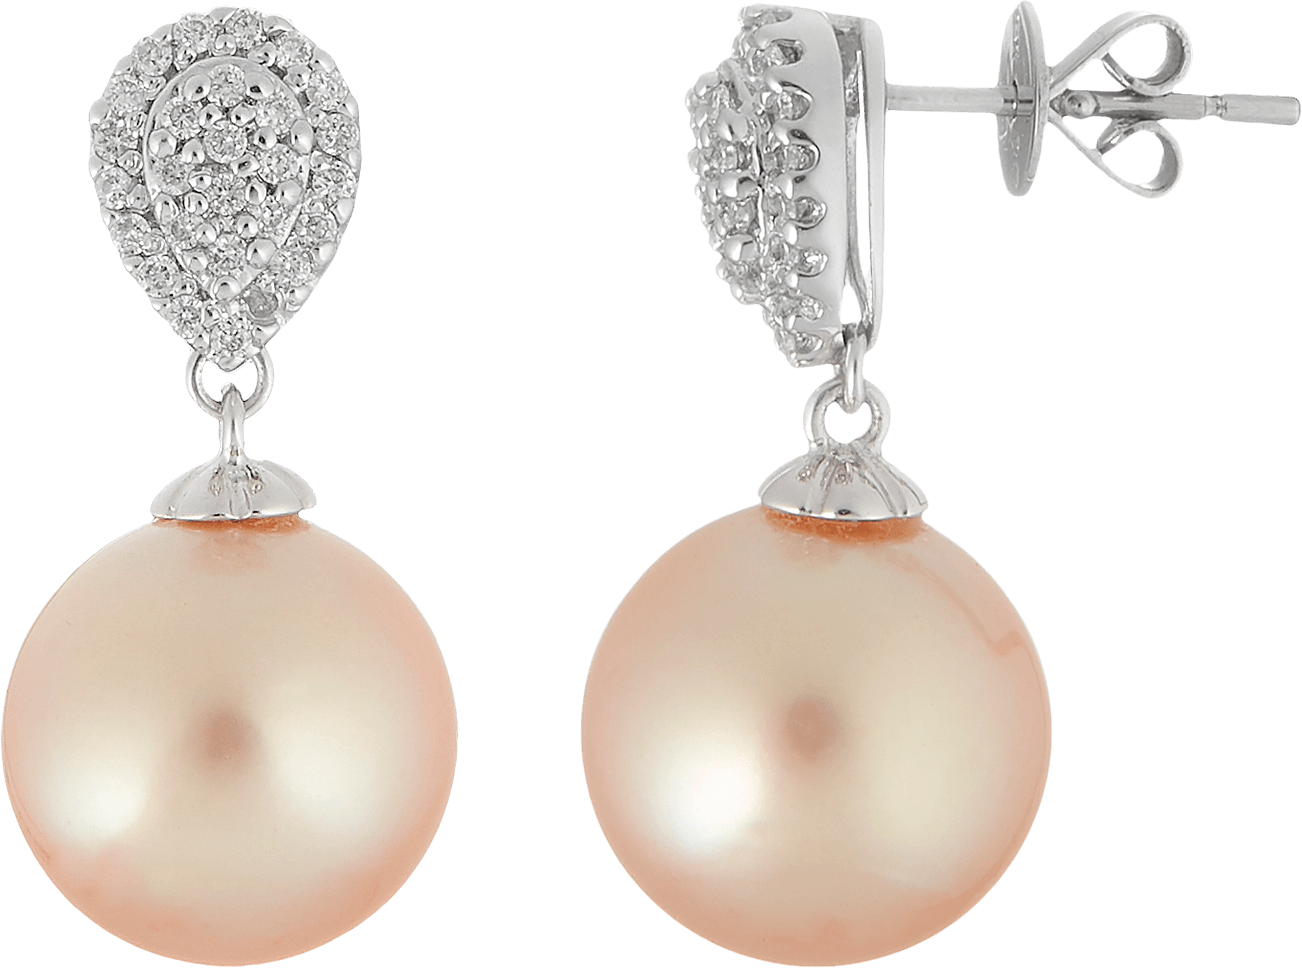 Гарнитур с жемчугом и бриллиантами